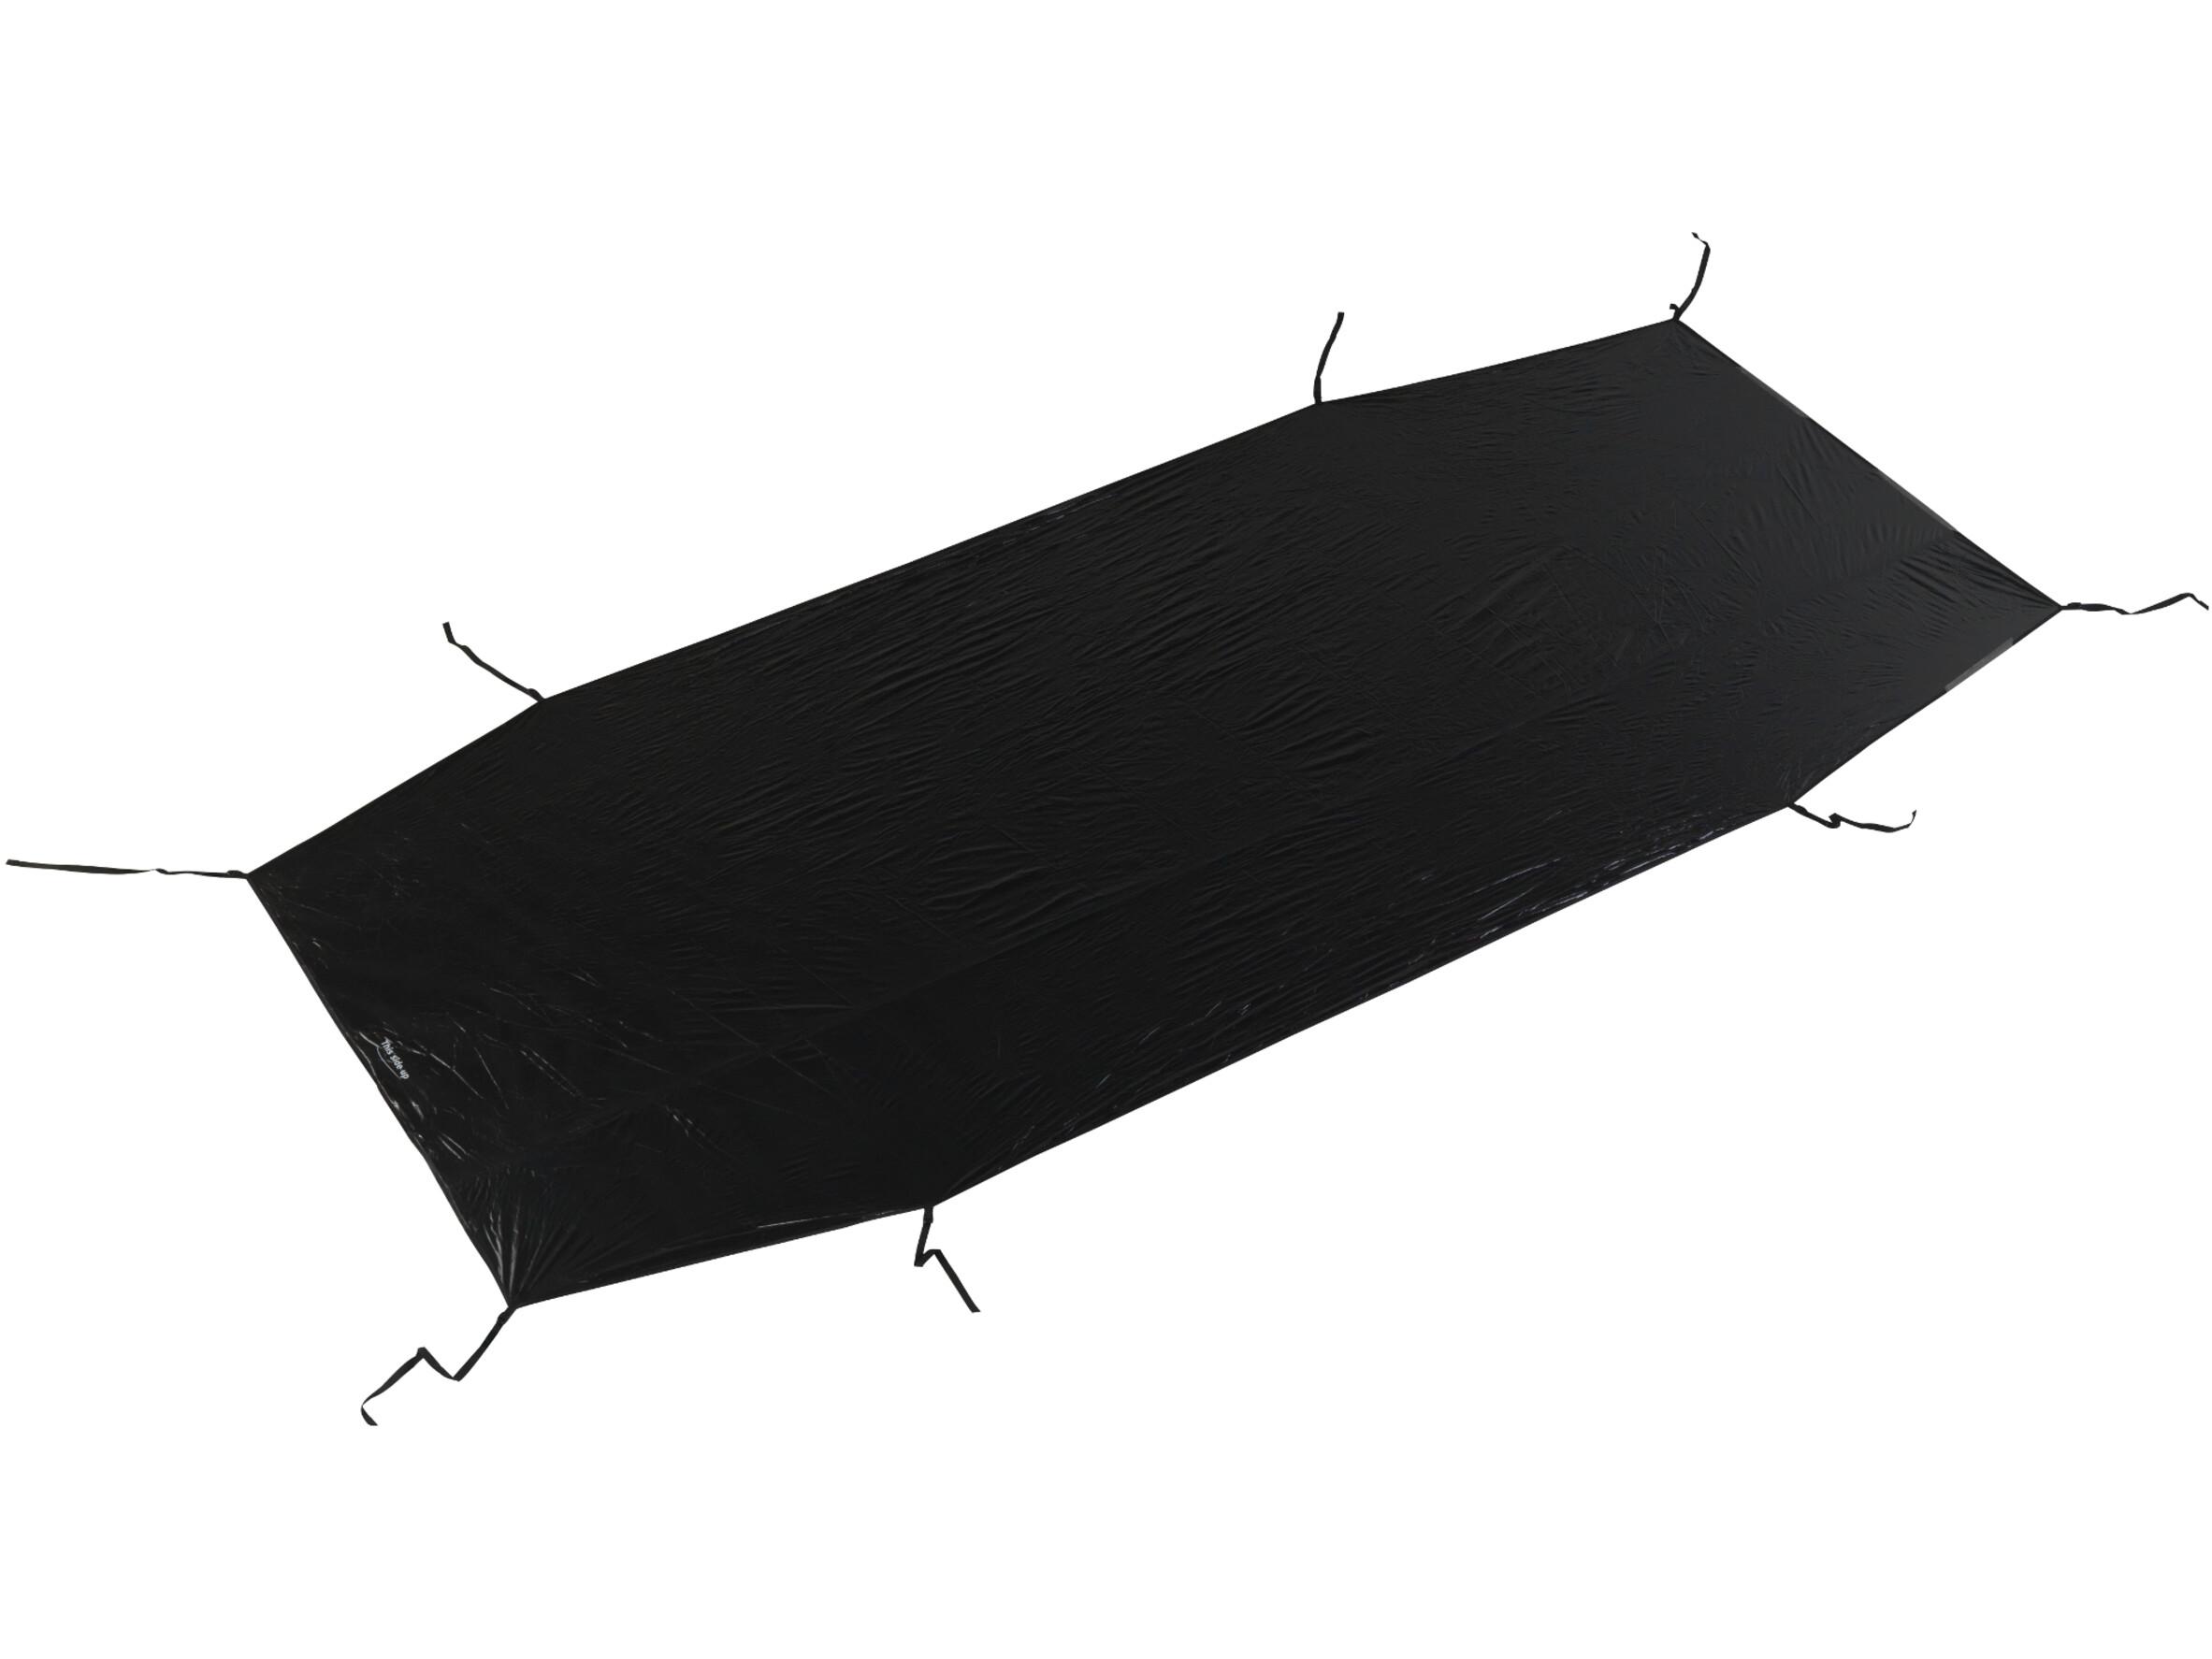 nordisk reisa 4 b che de sol sur campz. Black Bedroom Furniture Sets. Home Design Ideas